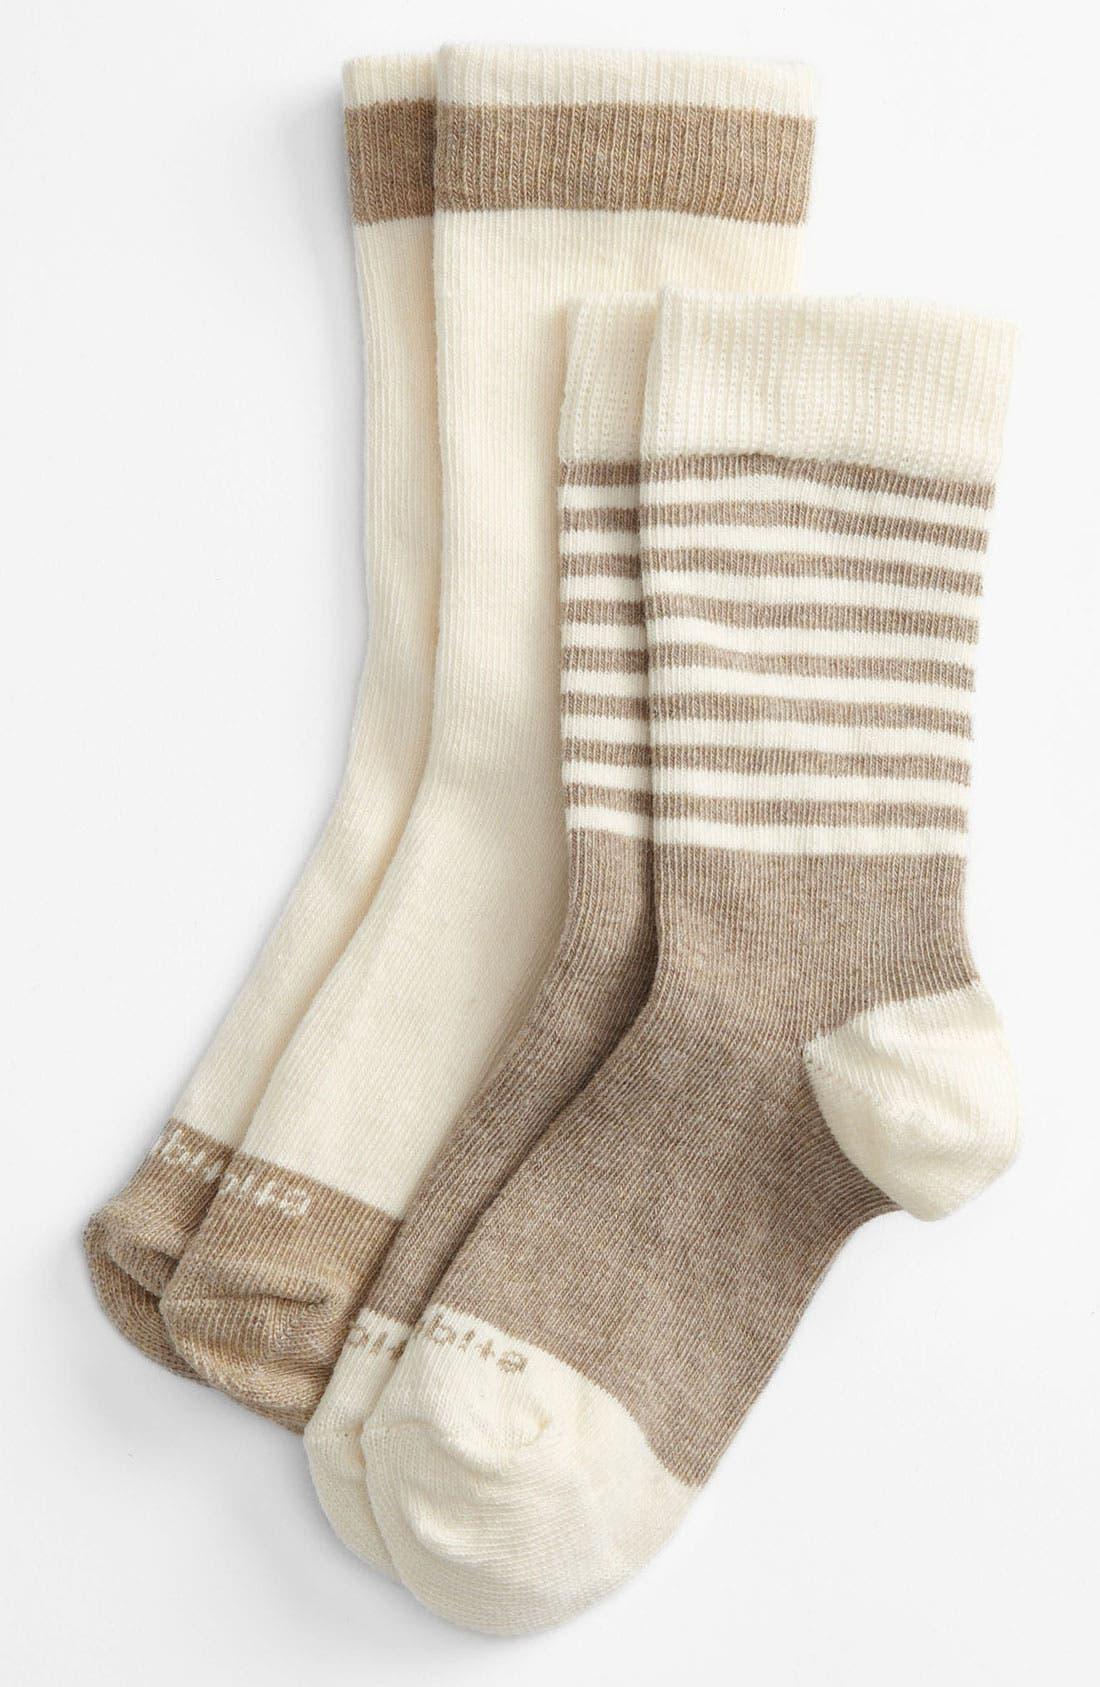 Main Image - Etiquette Clothiers 'Preppy Stripe' Socks (2-Pack) (Toddler, Little Kid & Big Kid)